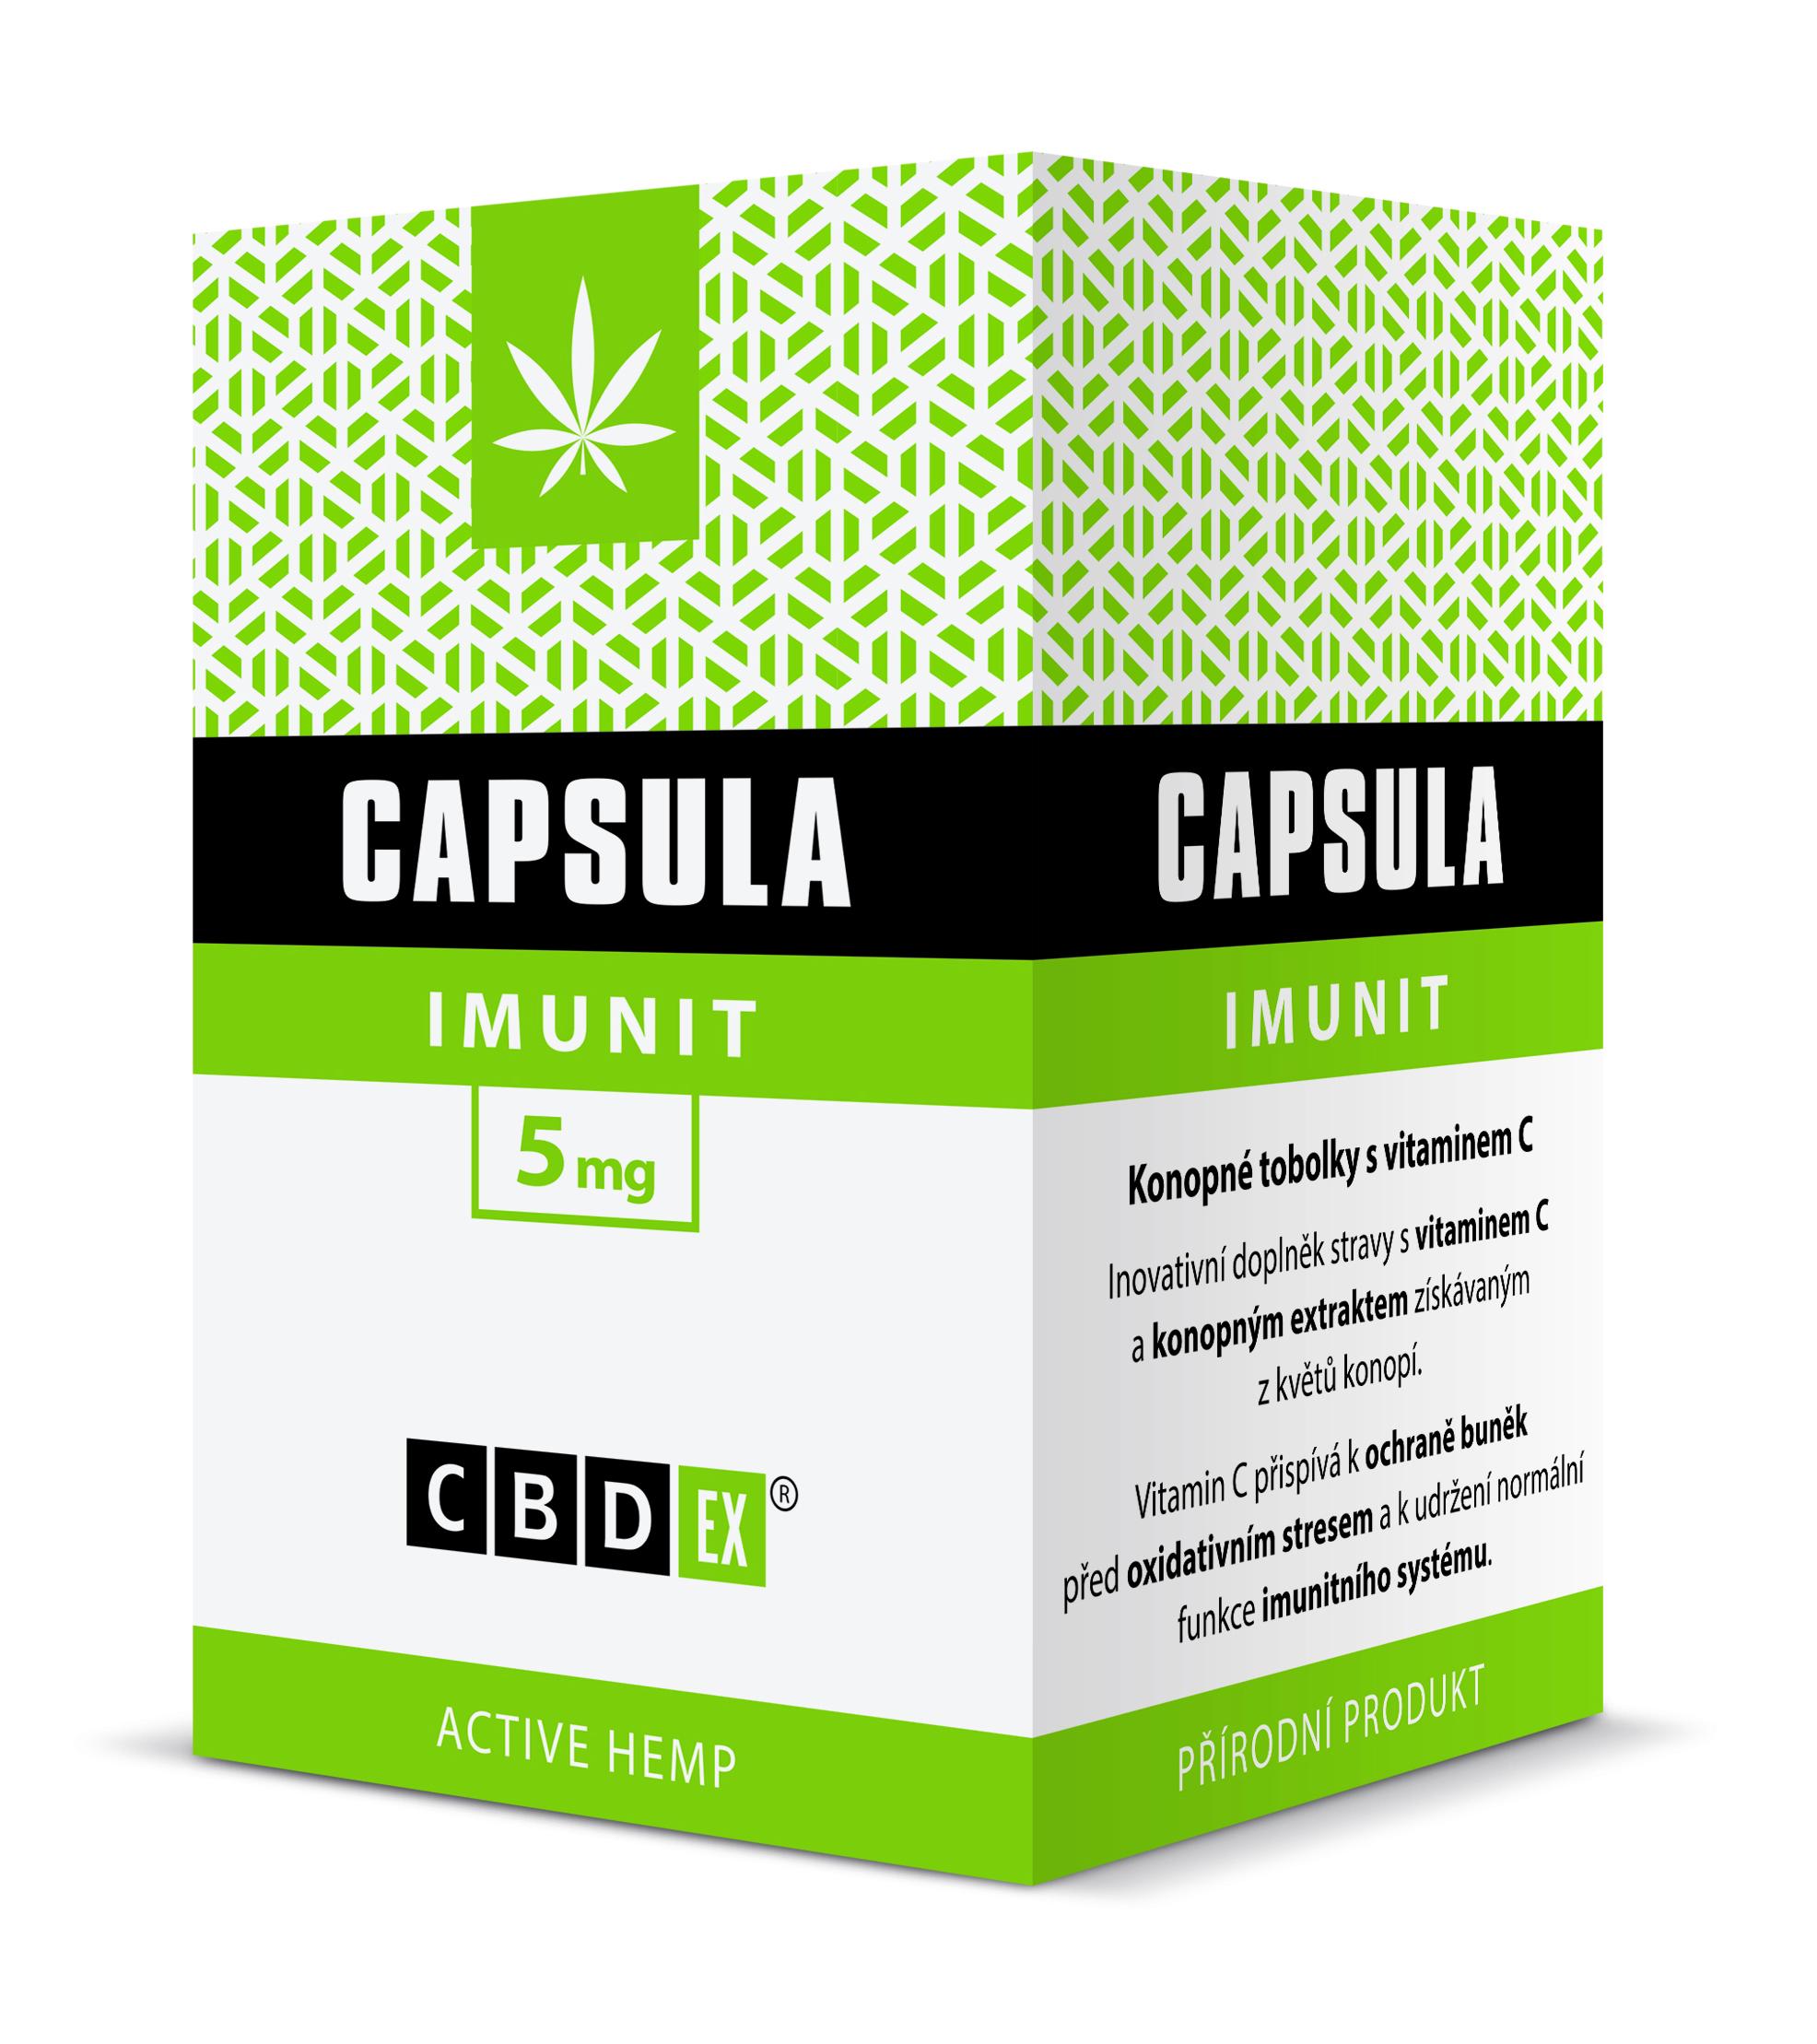 CBDex CBD Capsula Imunit 60 tobolek